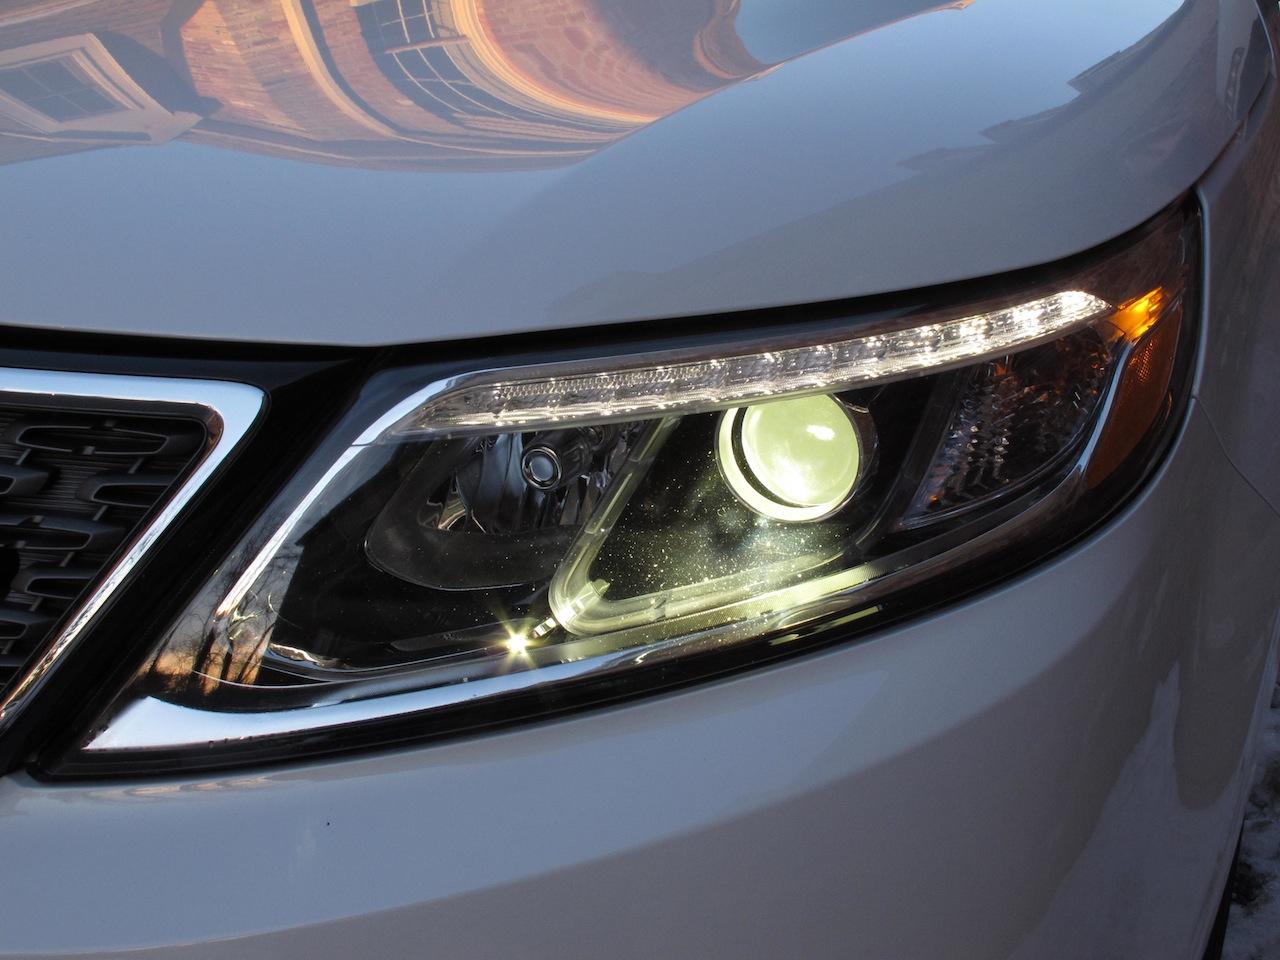 kia sorento review cars  test drives  reviews canadian auto review